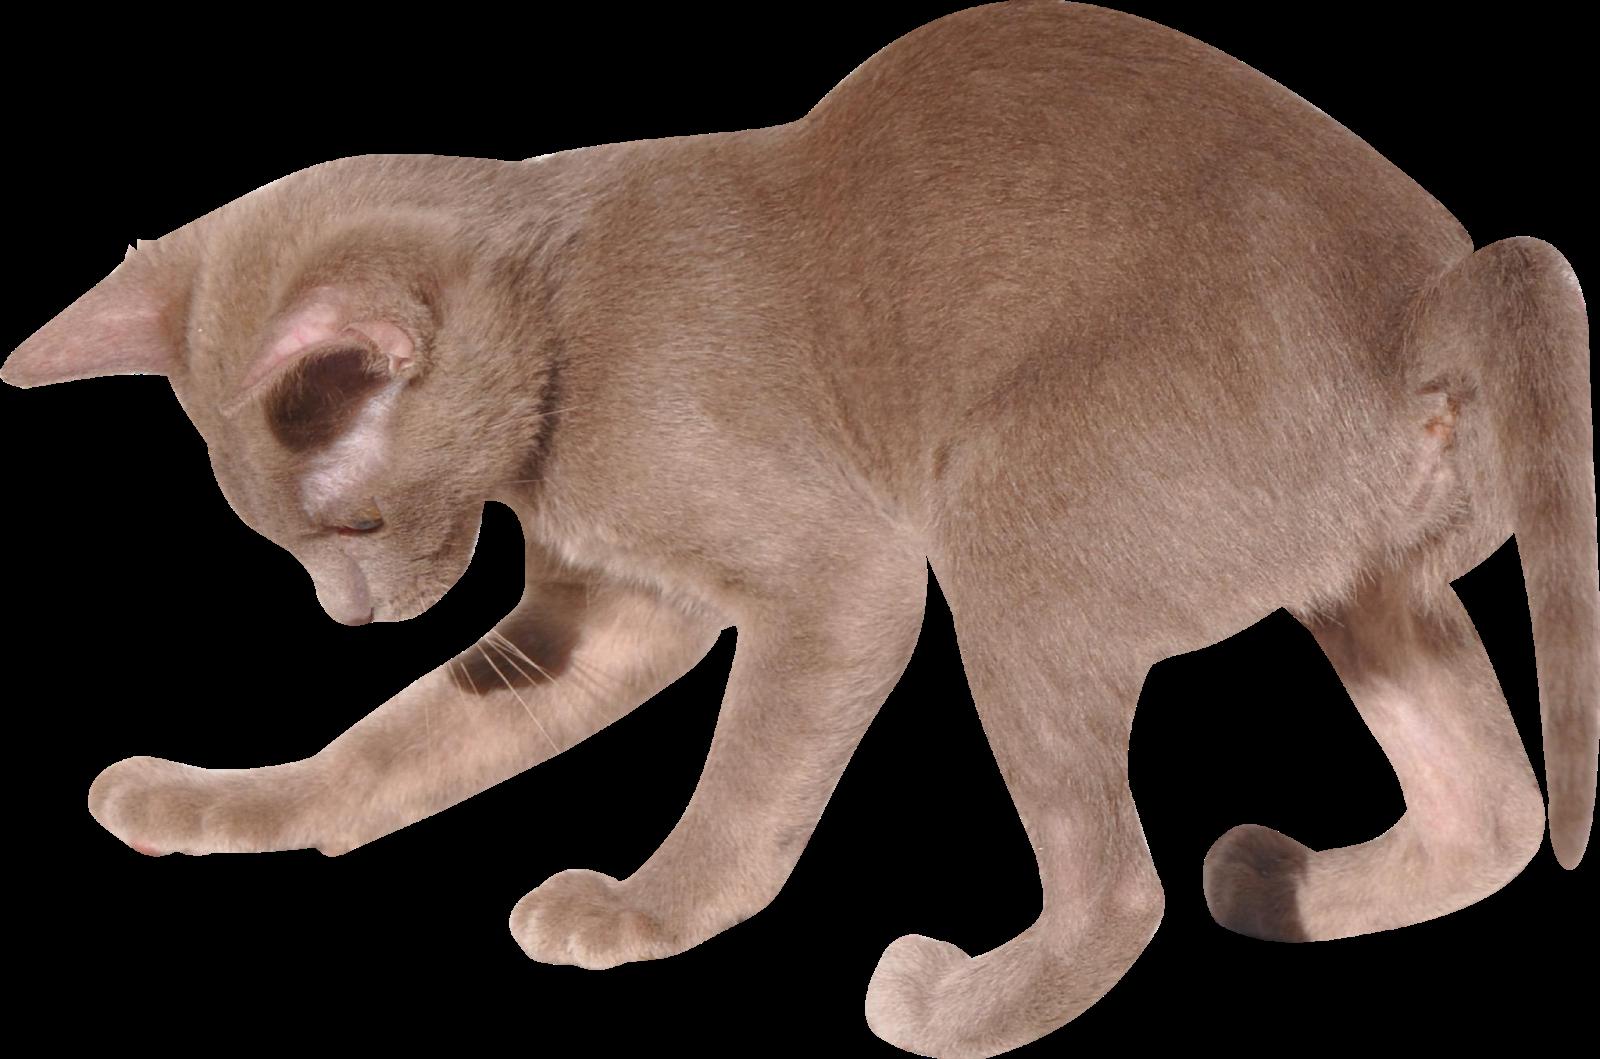 Dry cat food bag clipart. Free images digital kitten